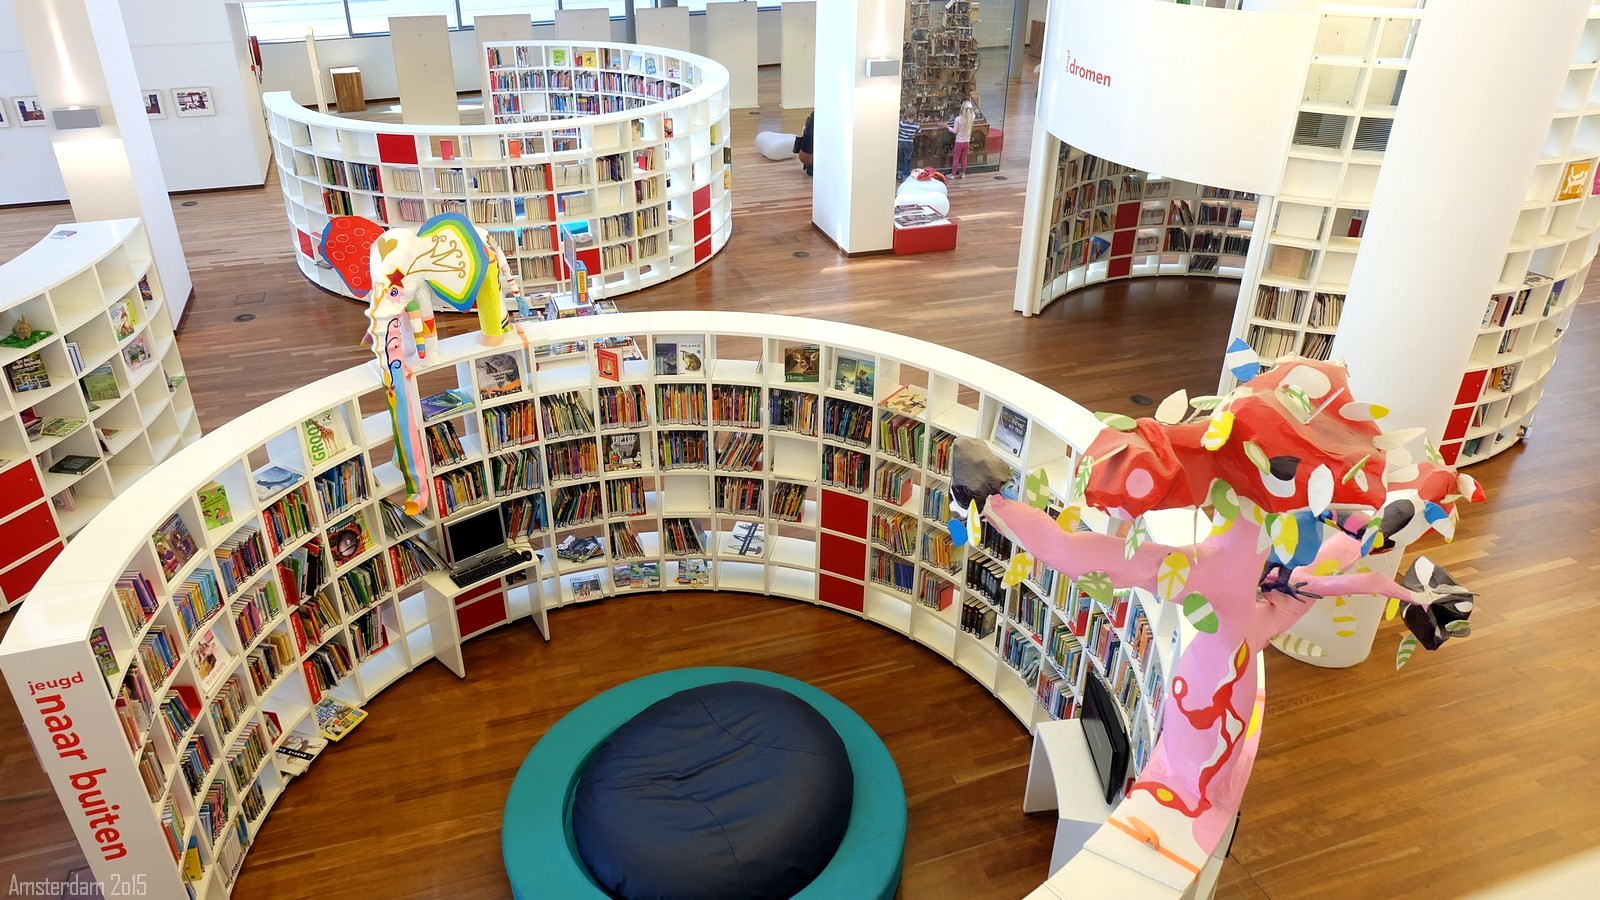 Public Library, Amsterdam, Nederland